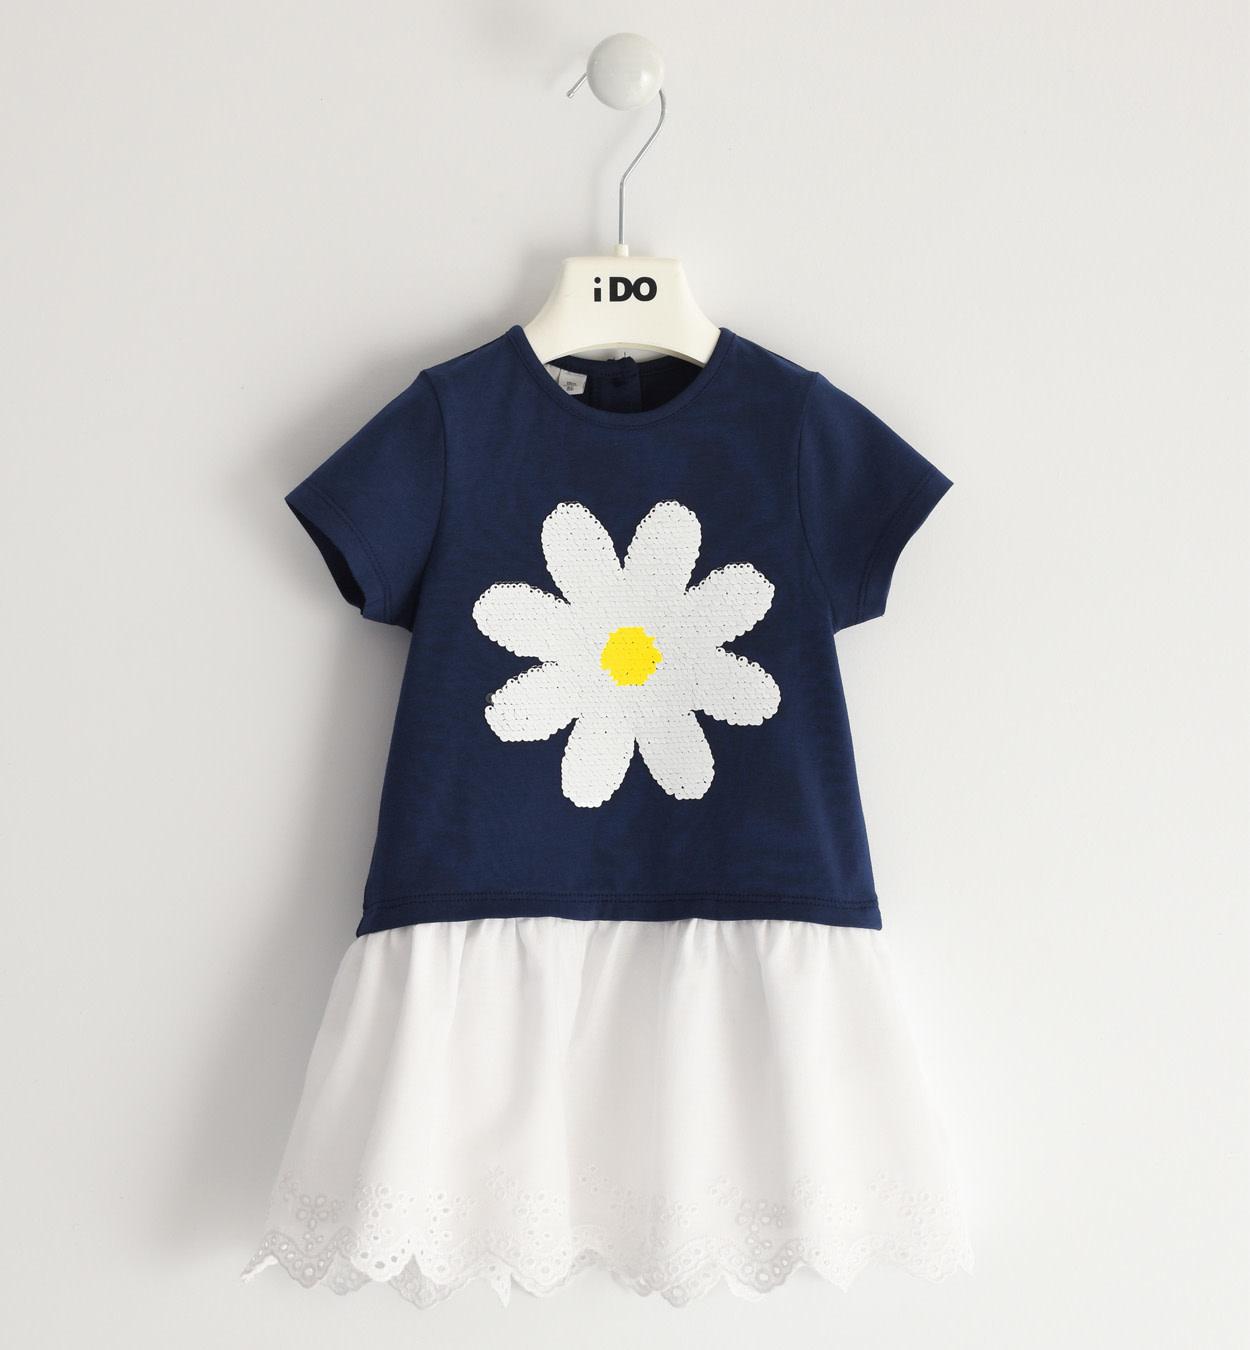 iDo iDo SS20 Girls summer daisy dress J300